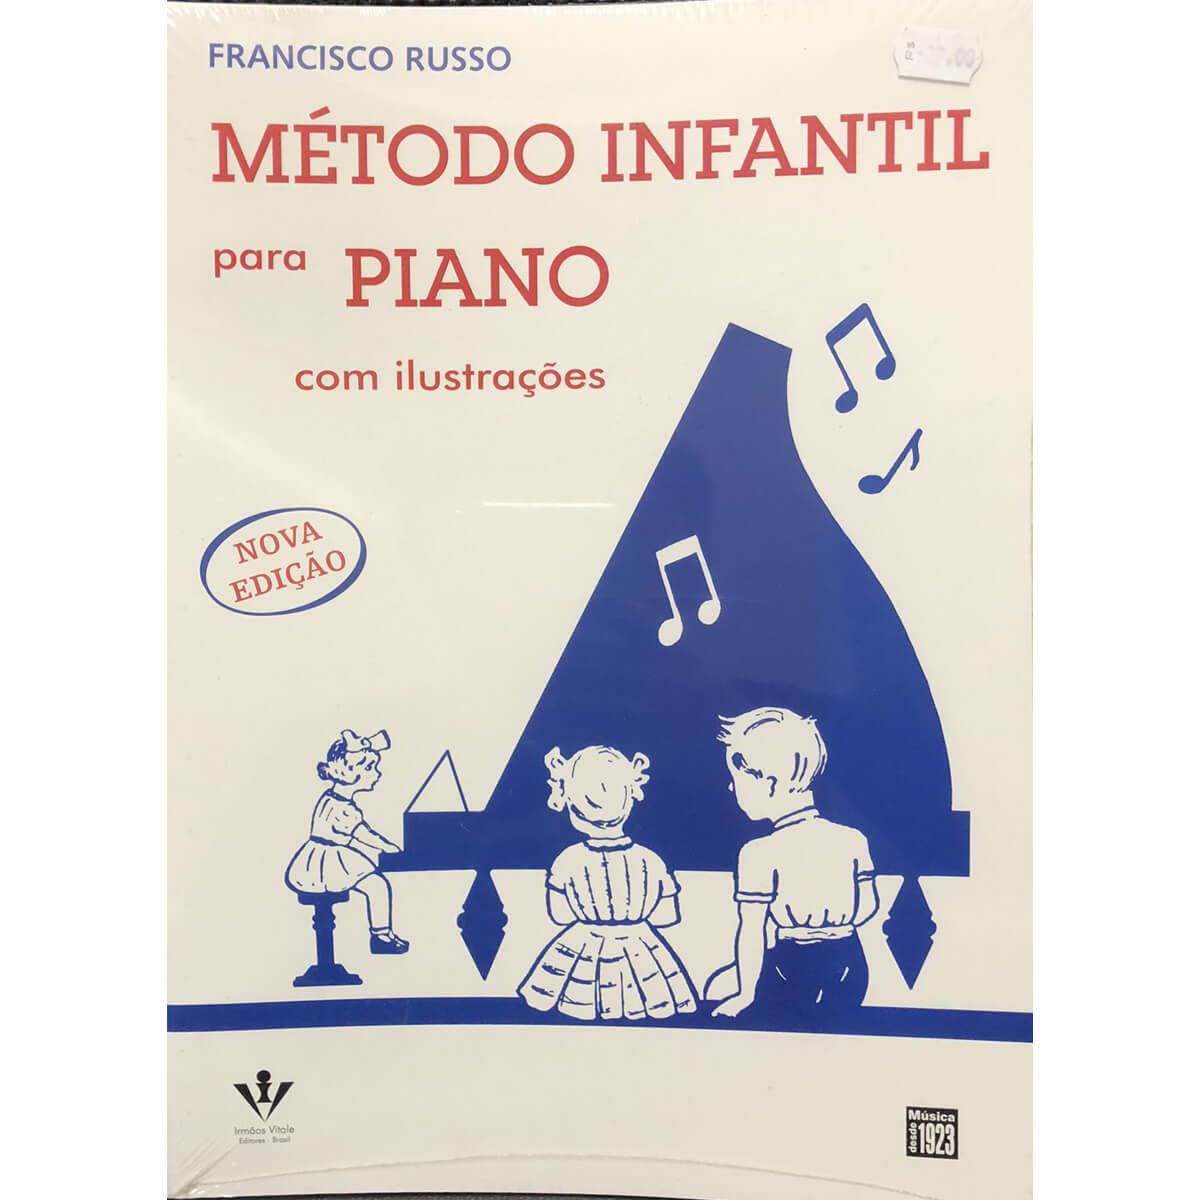 Método - Infantil - Piano - Francisco Russo